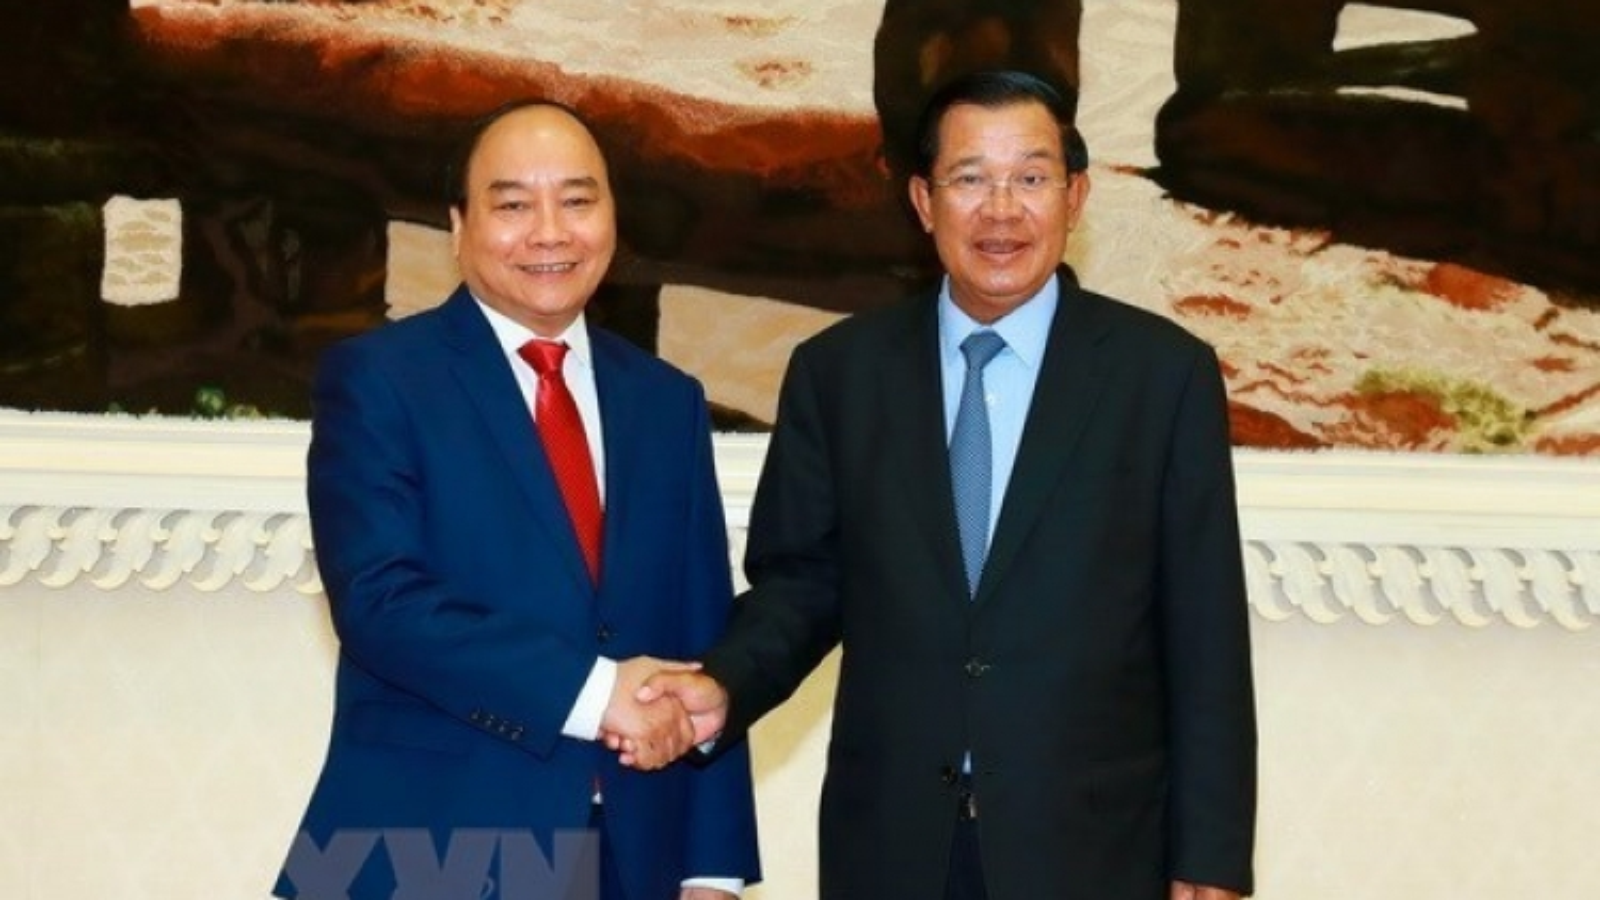 PM Hun Sen: Cambodia treasures ties with Vietnam